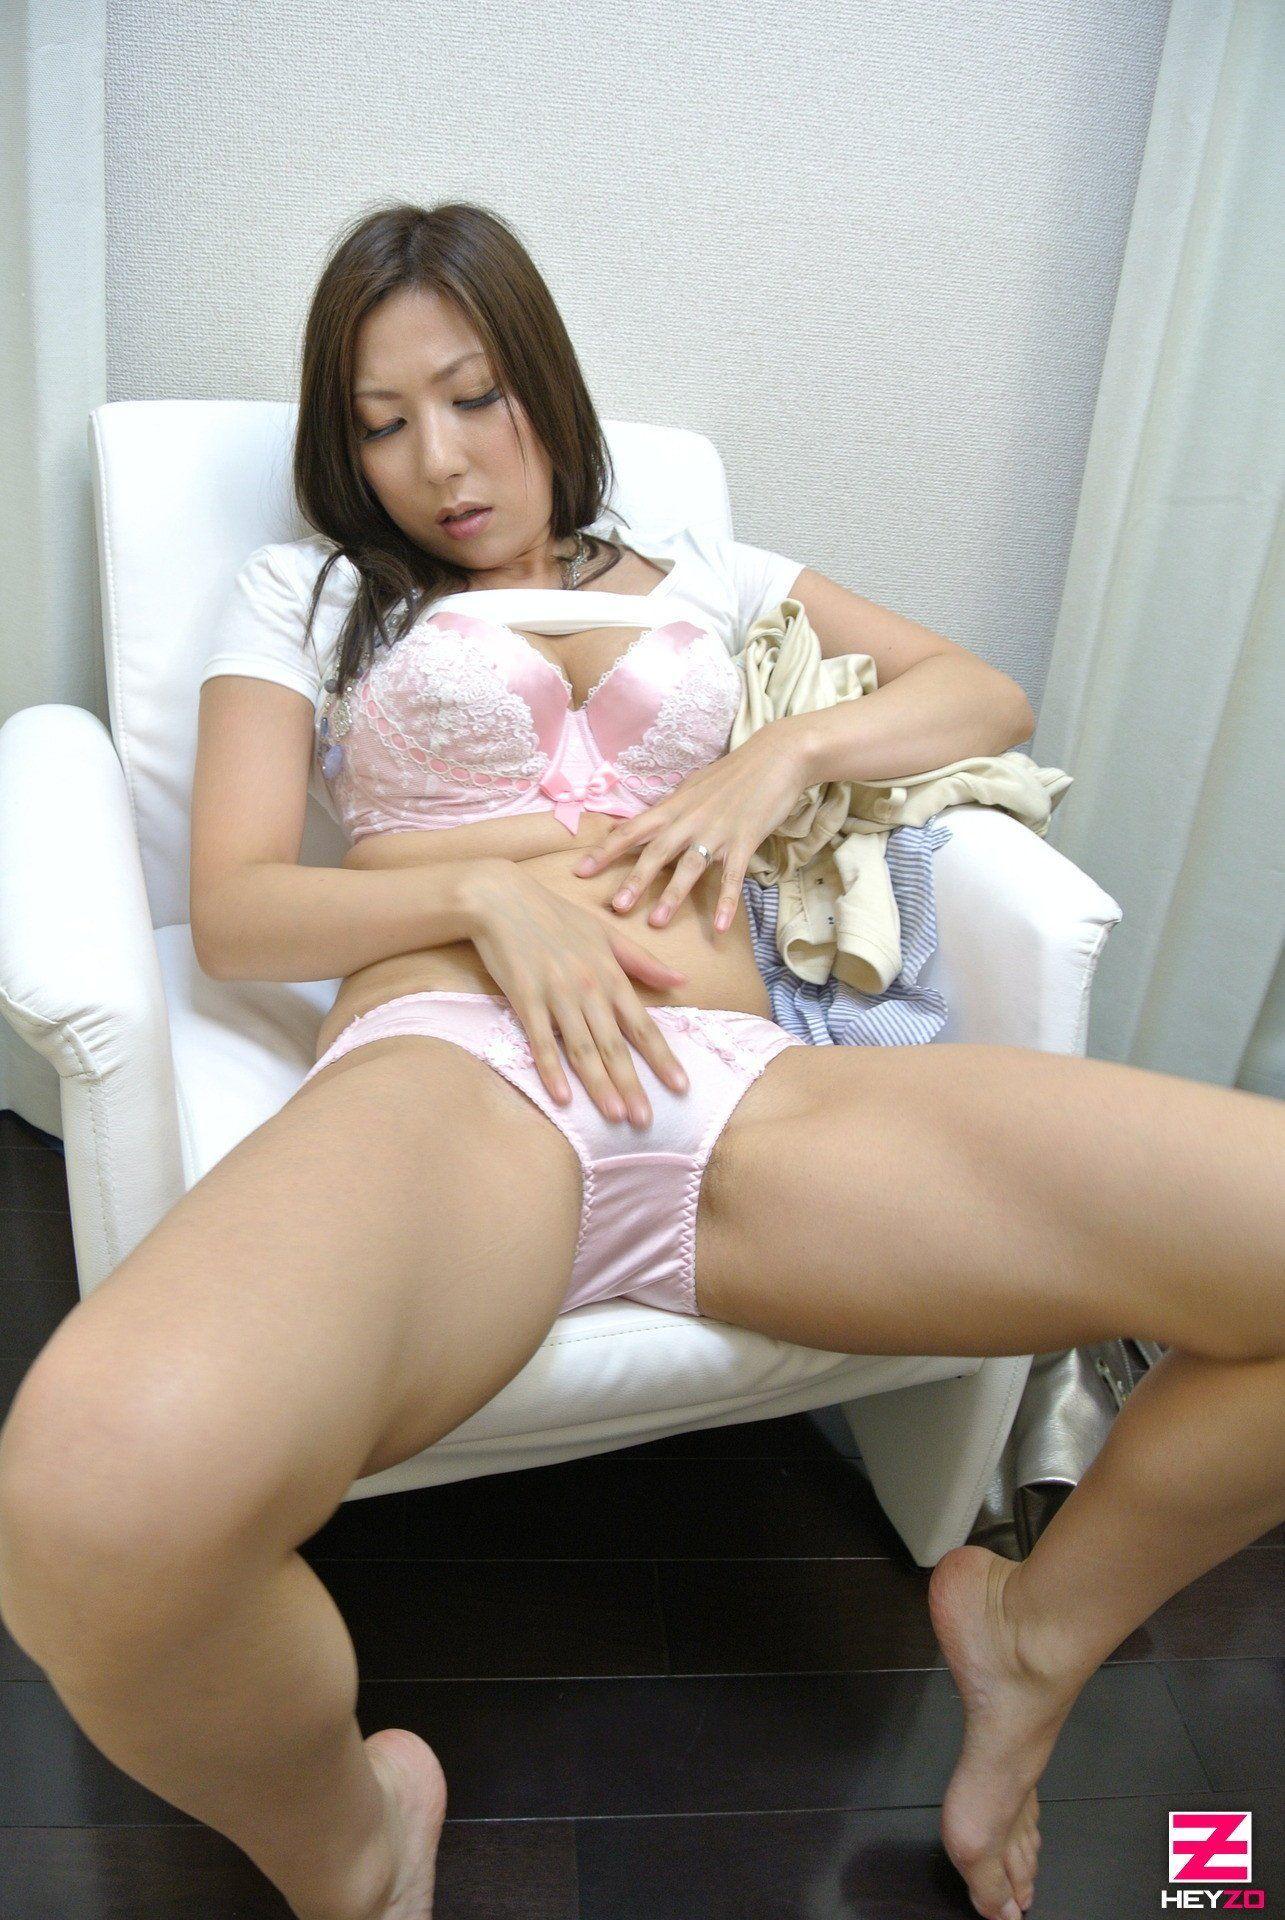 Lesbian moms pussy licking